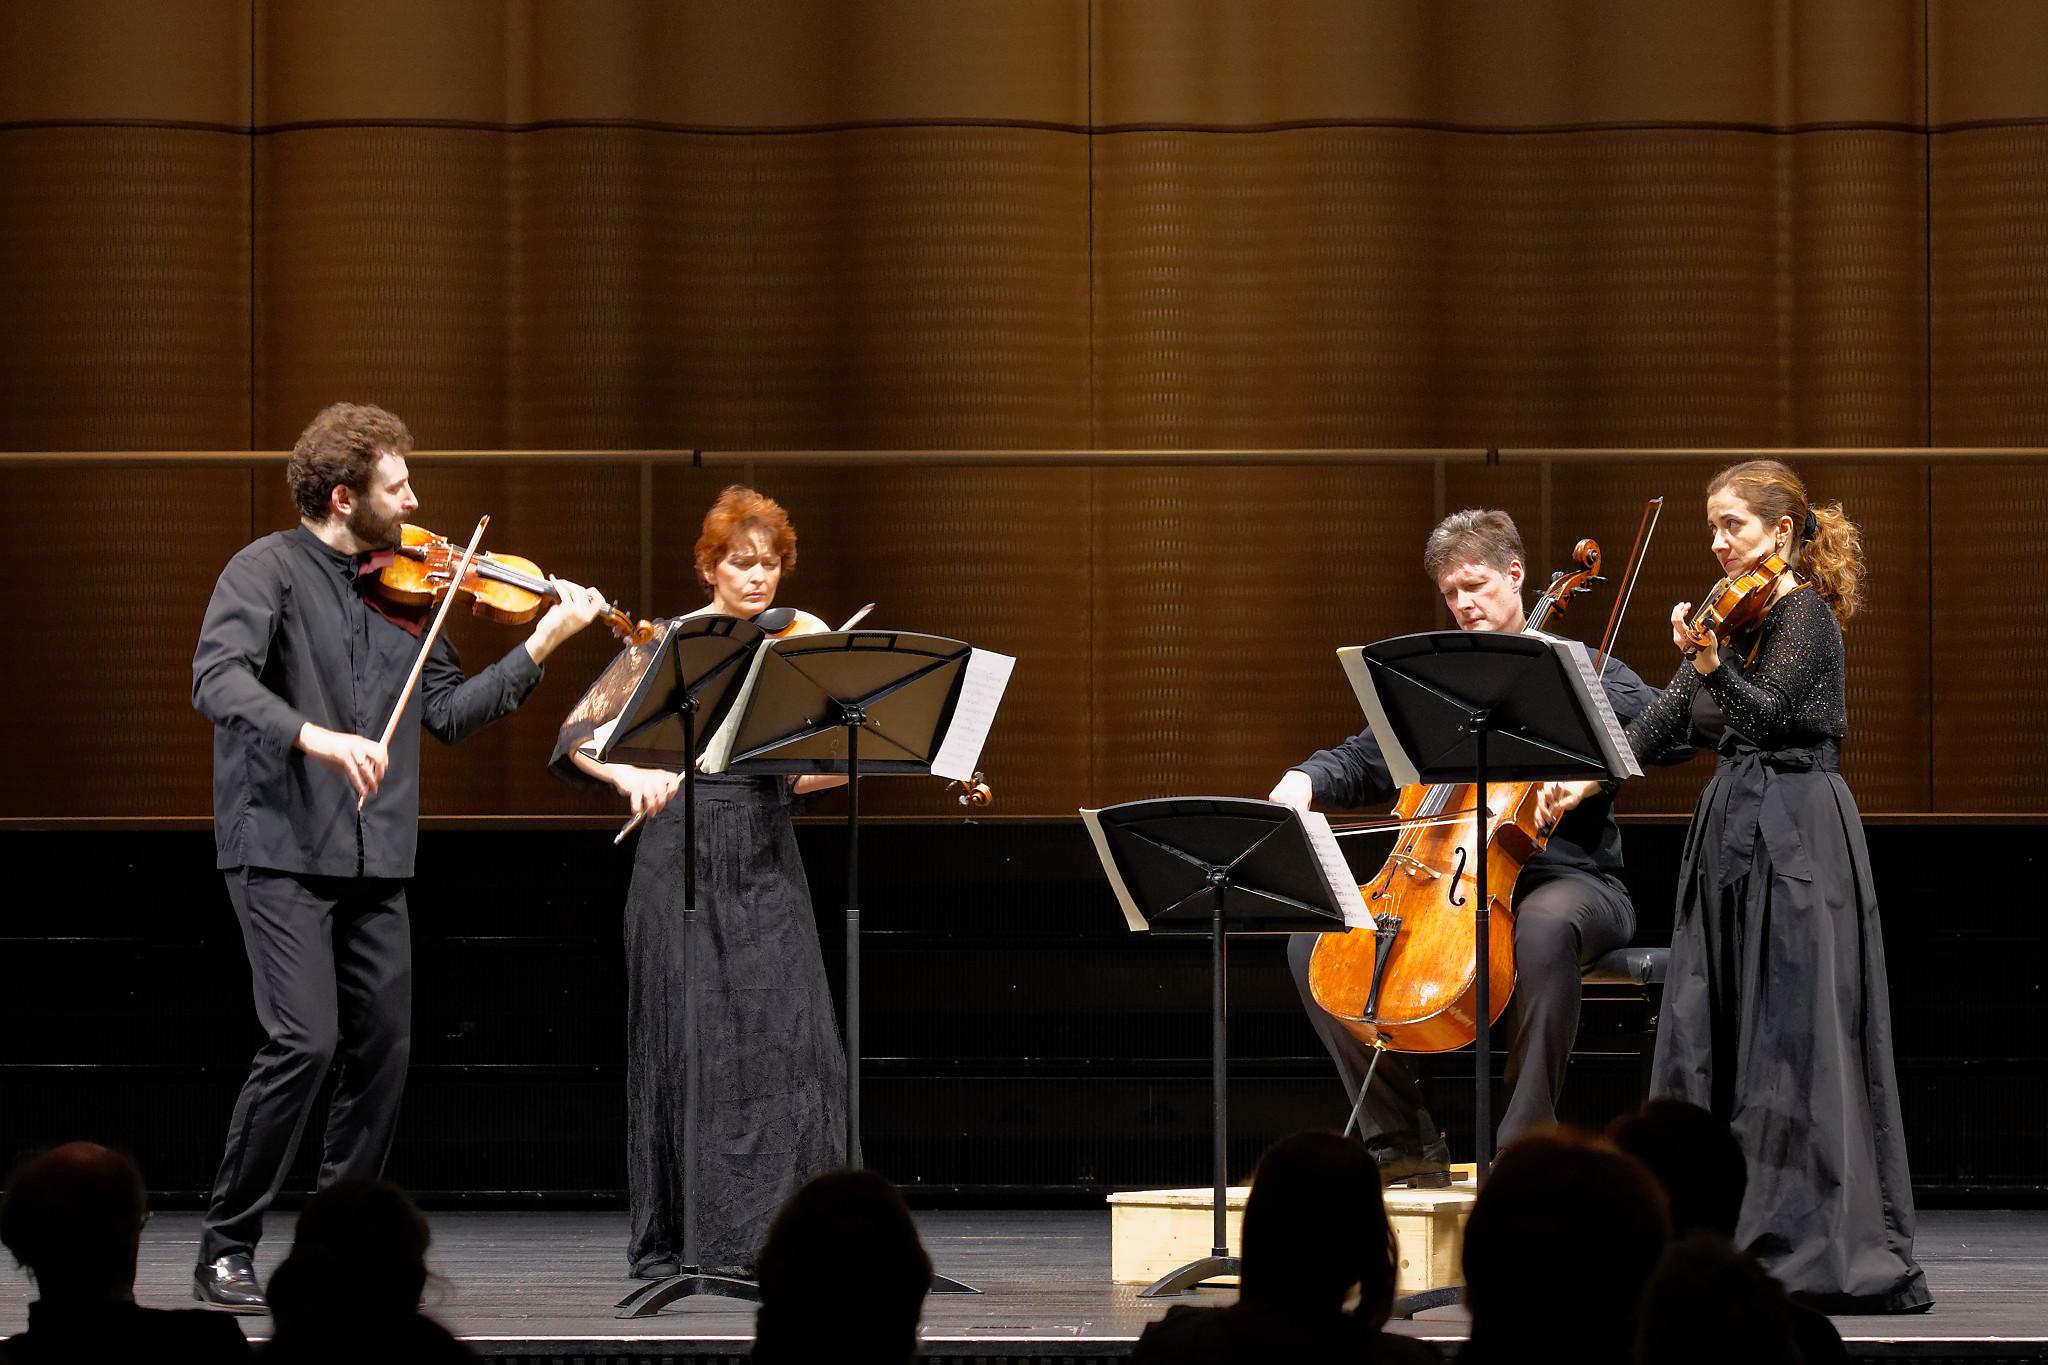 Gringolts Quartet @ ZHdK, Zurich, 2020-02-24 (© Rolf Kyburz)